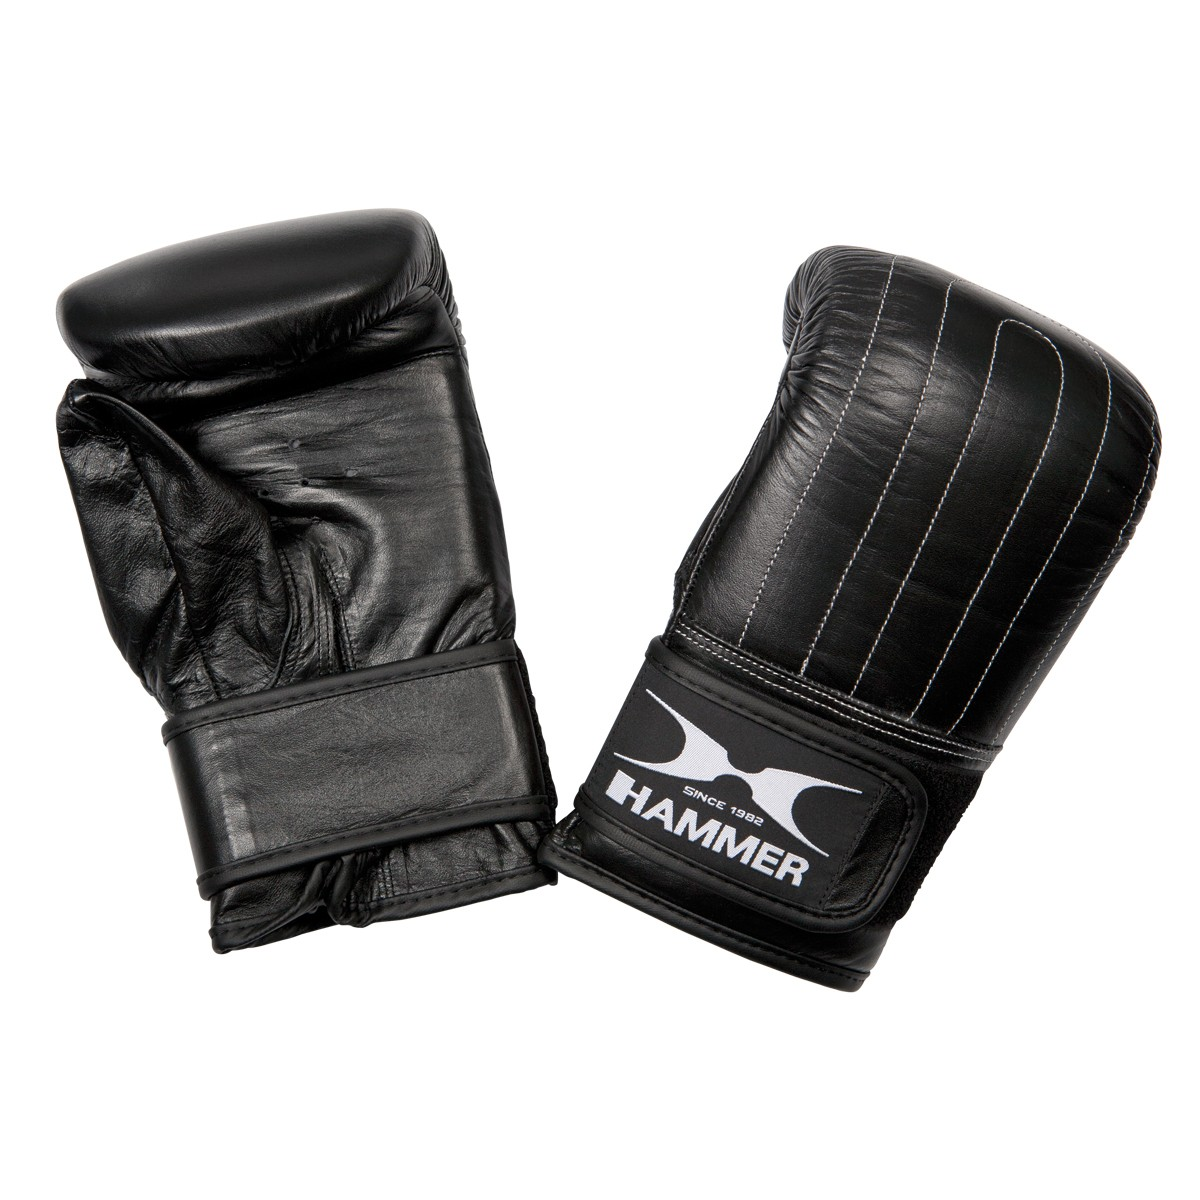 Hammer MMA Fight S kesztyű - Gorillasport.hu